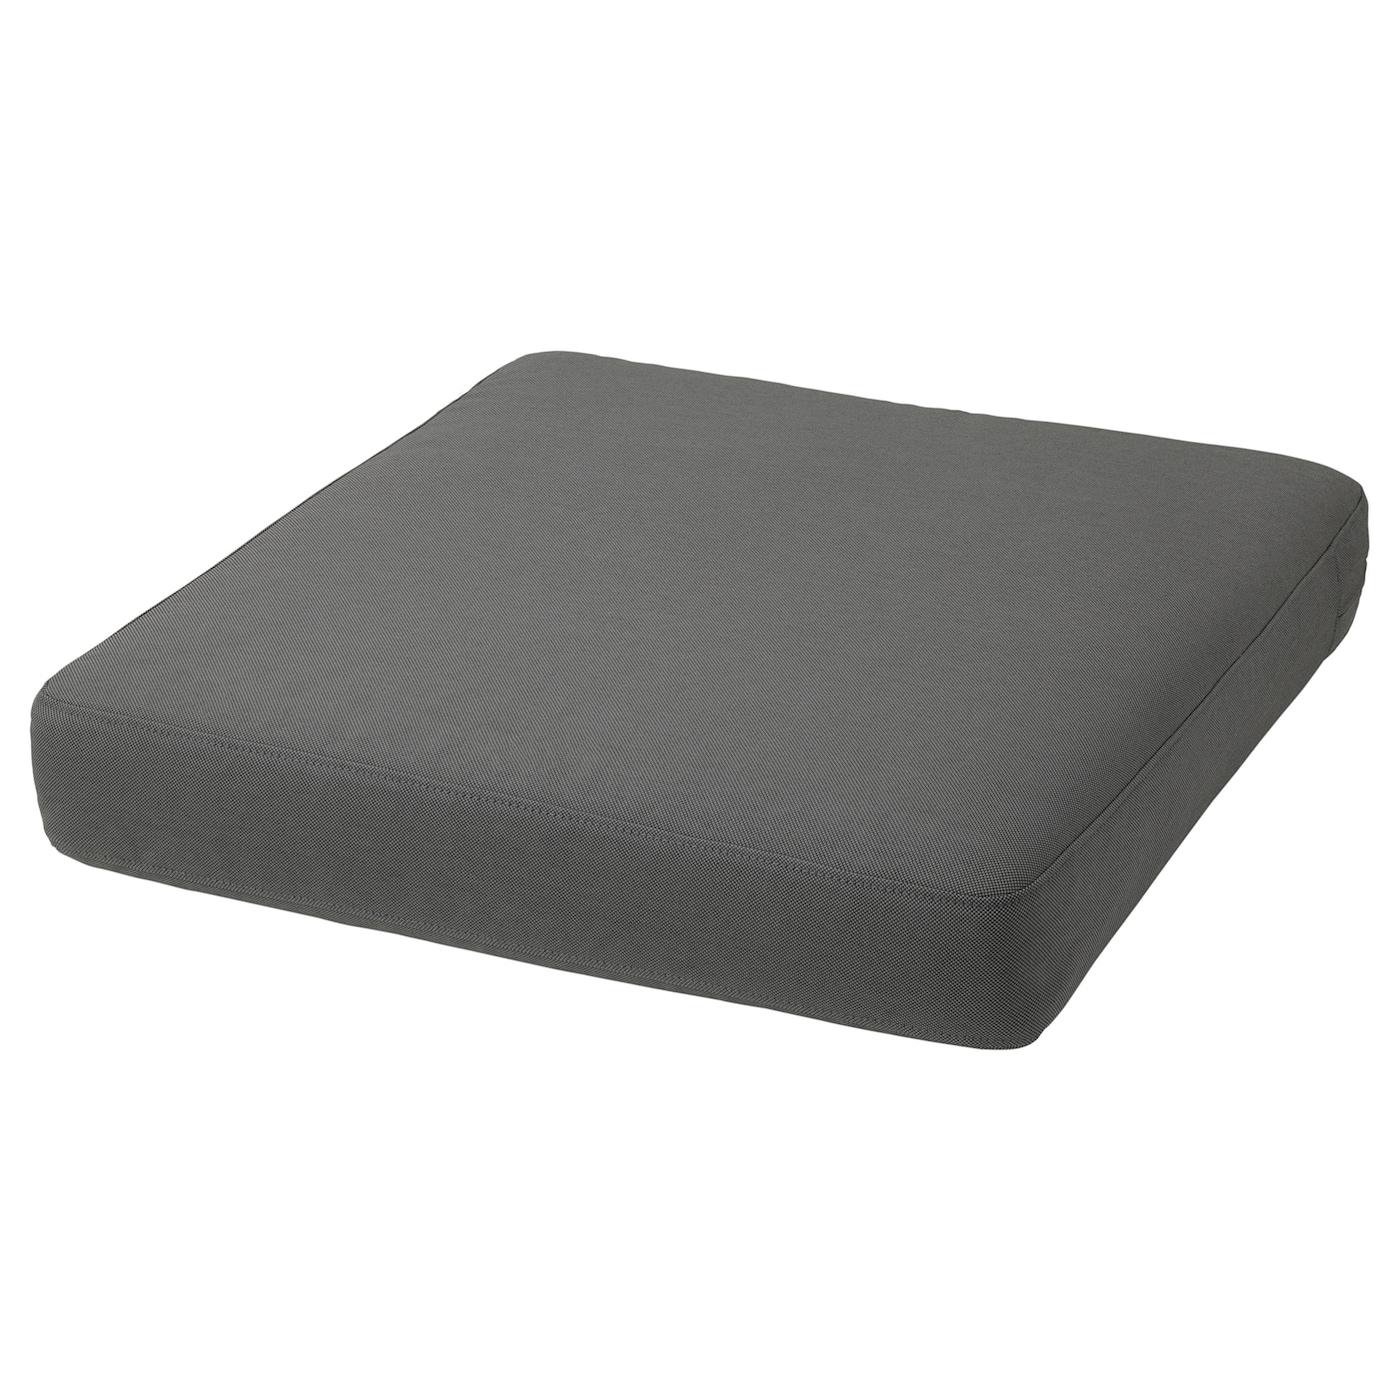 FRÖSÖN/DUVHOLMEN Seat cushion, outdoor - dark grey 8x8 cm